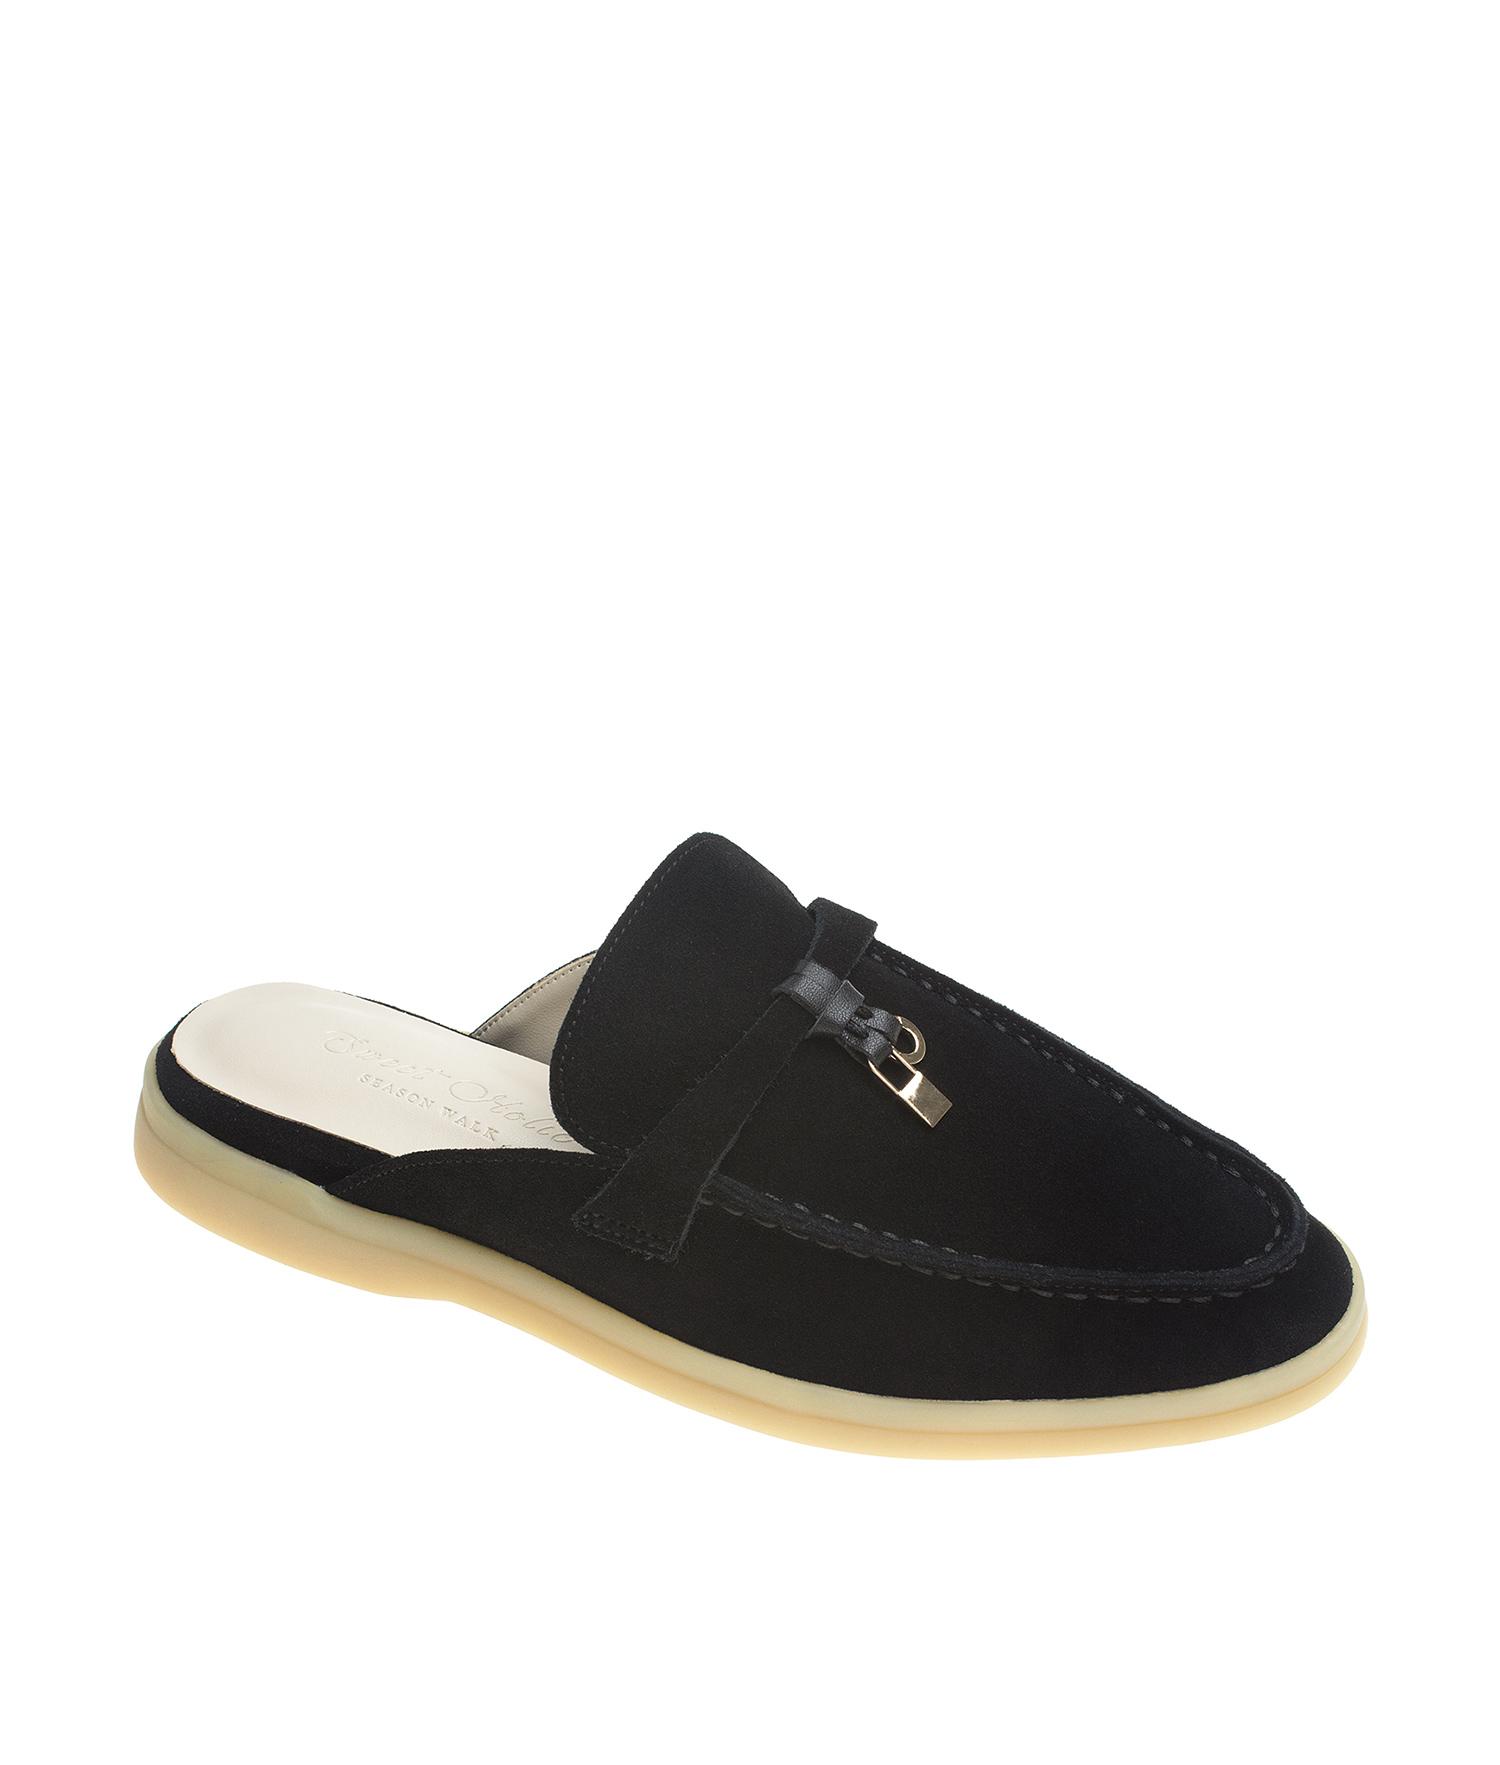 Suede Leather Sleek Toe Backless Loafer